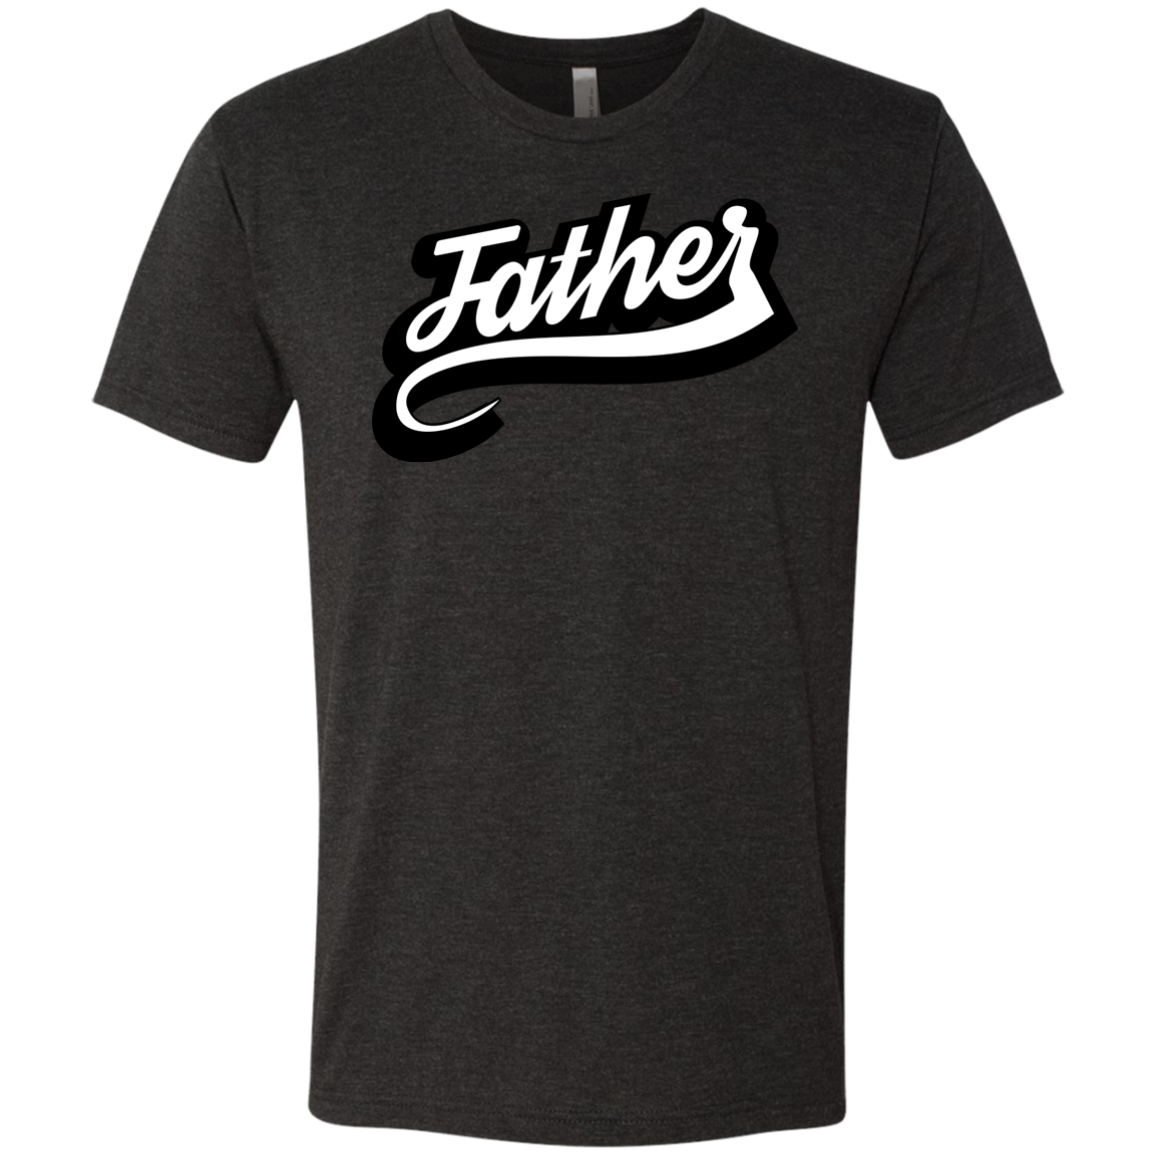 Father | Men's Tri-Blend T-Shirt